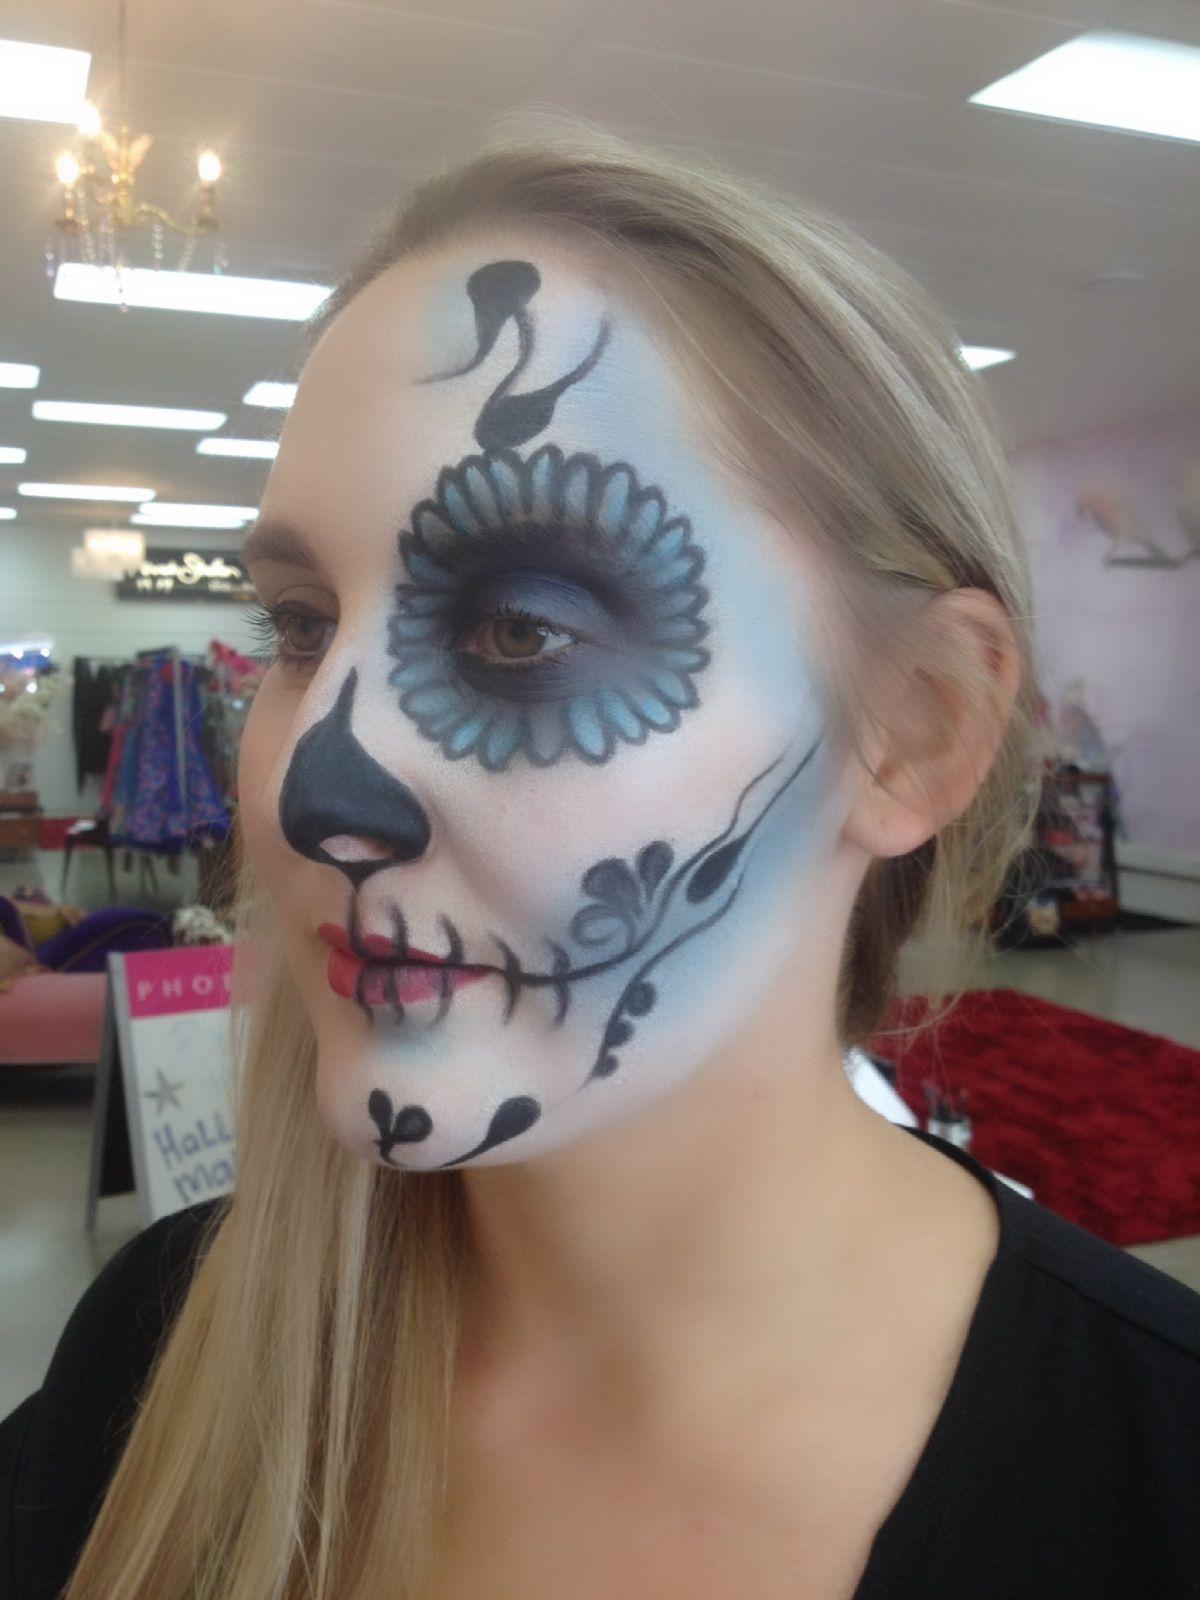 Sugar Skull Makeup for Halloween by Pink Lady Anita!